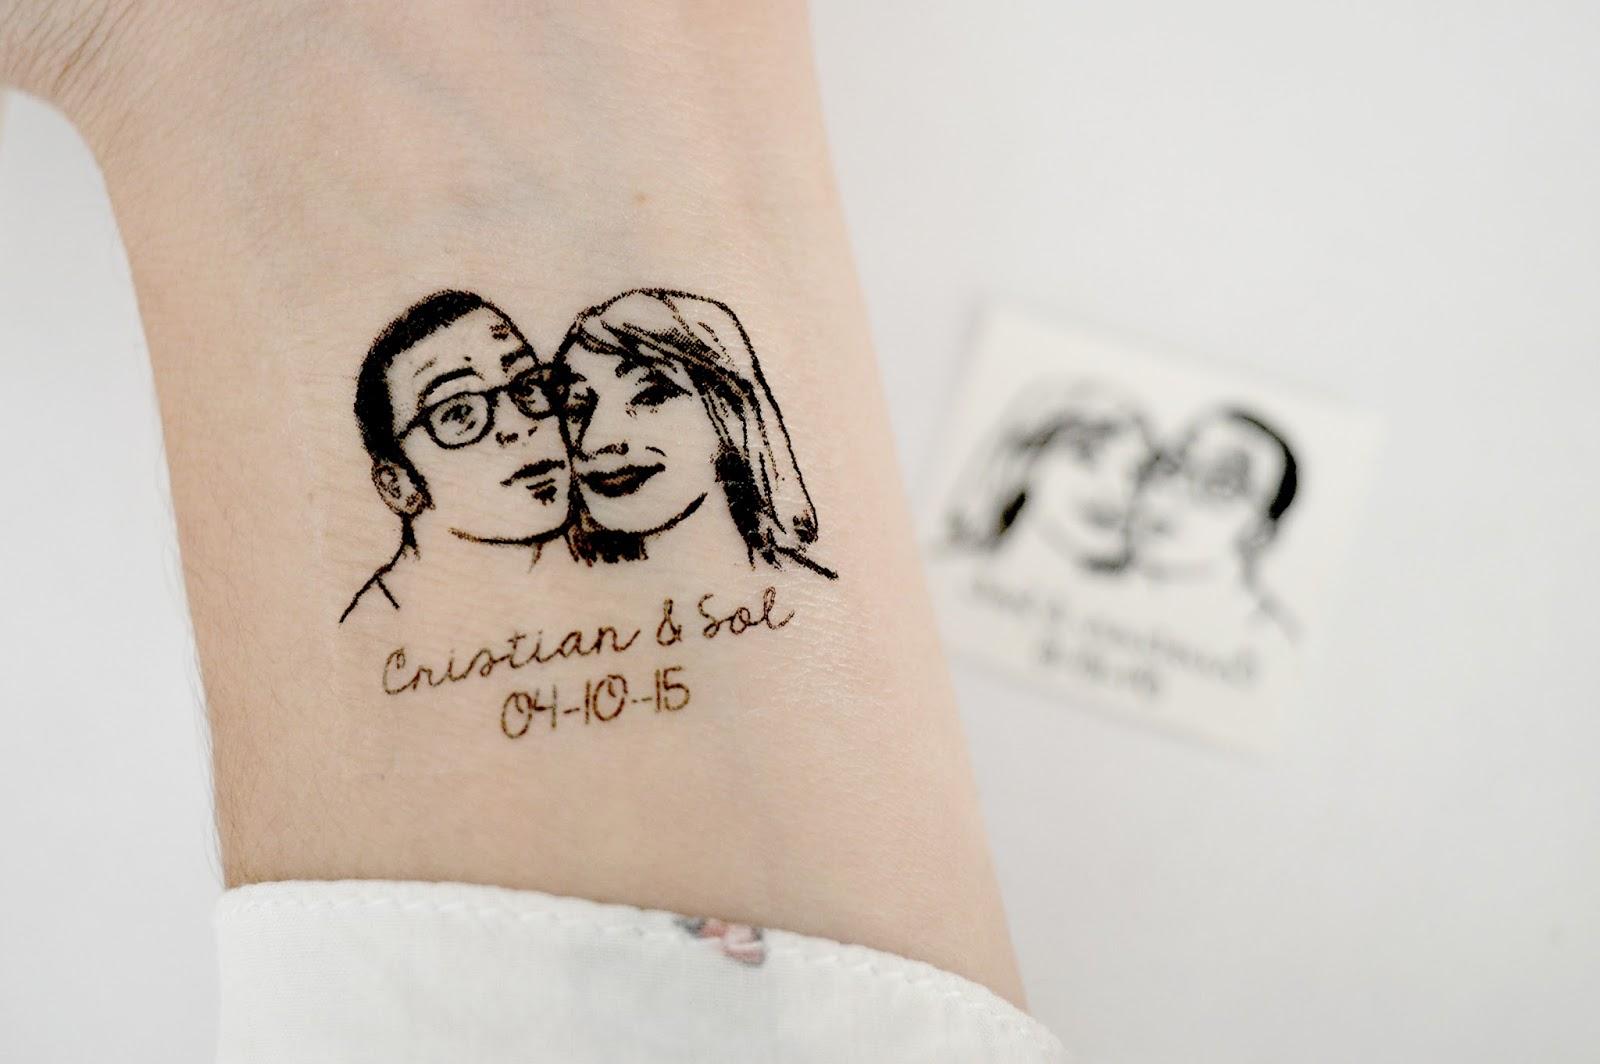 Matrimonio Tema Tatuaggi : Pearls to pigeons tatuaggio temporaneo per matrimoni